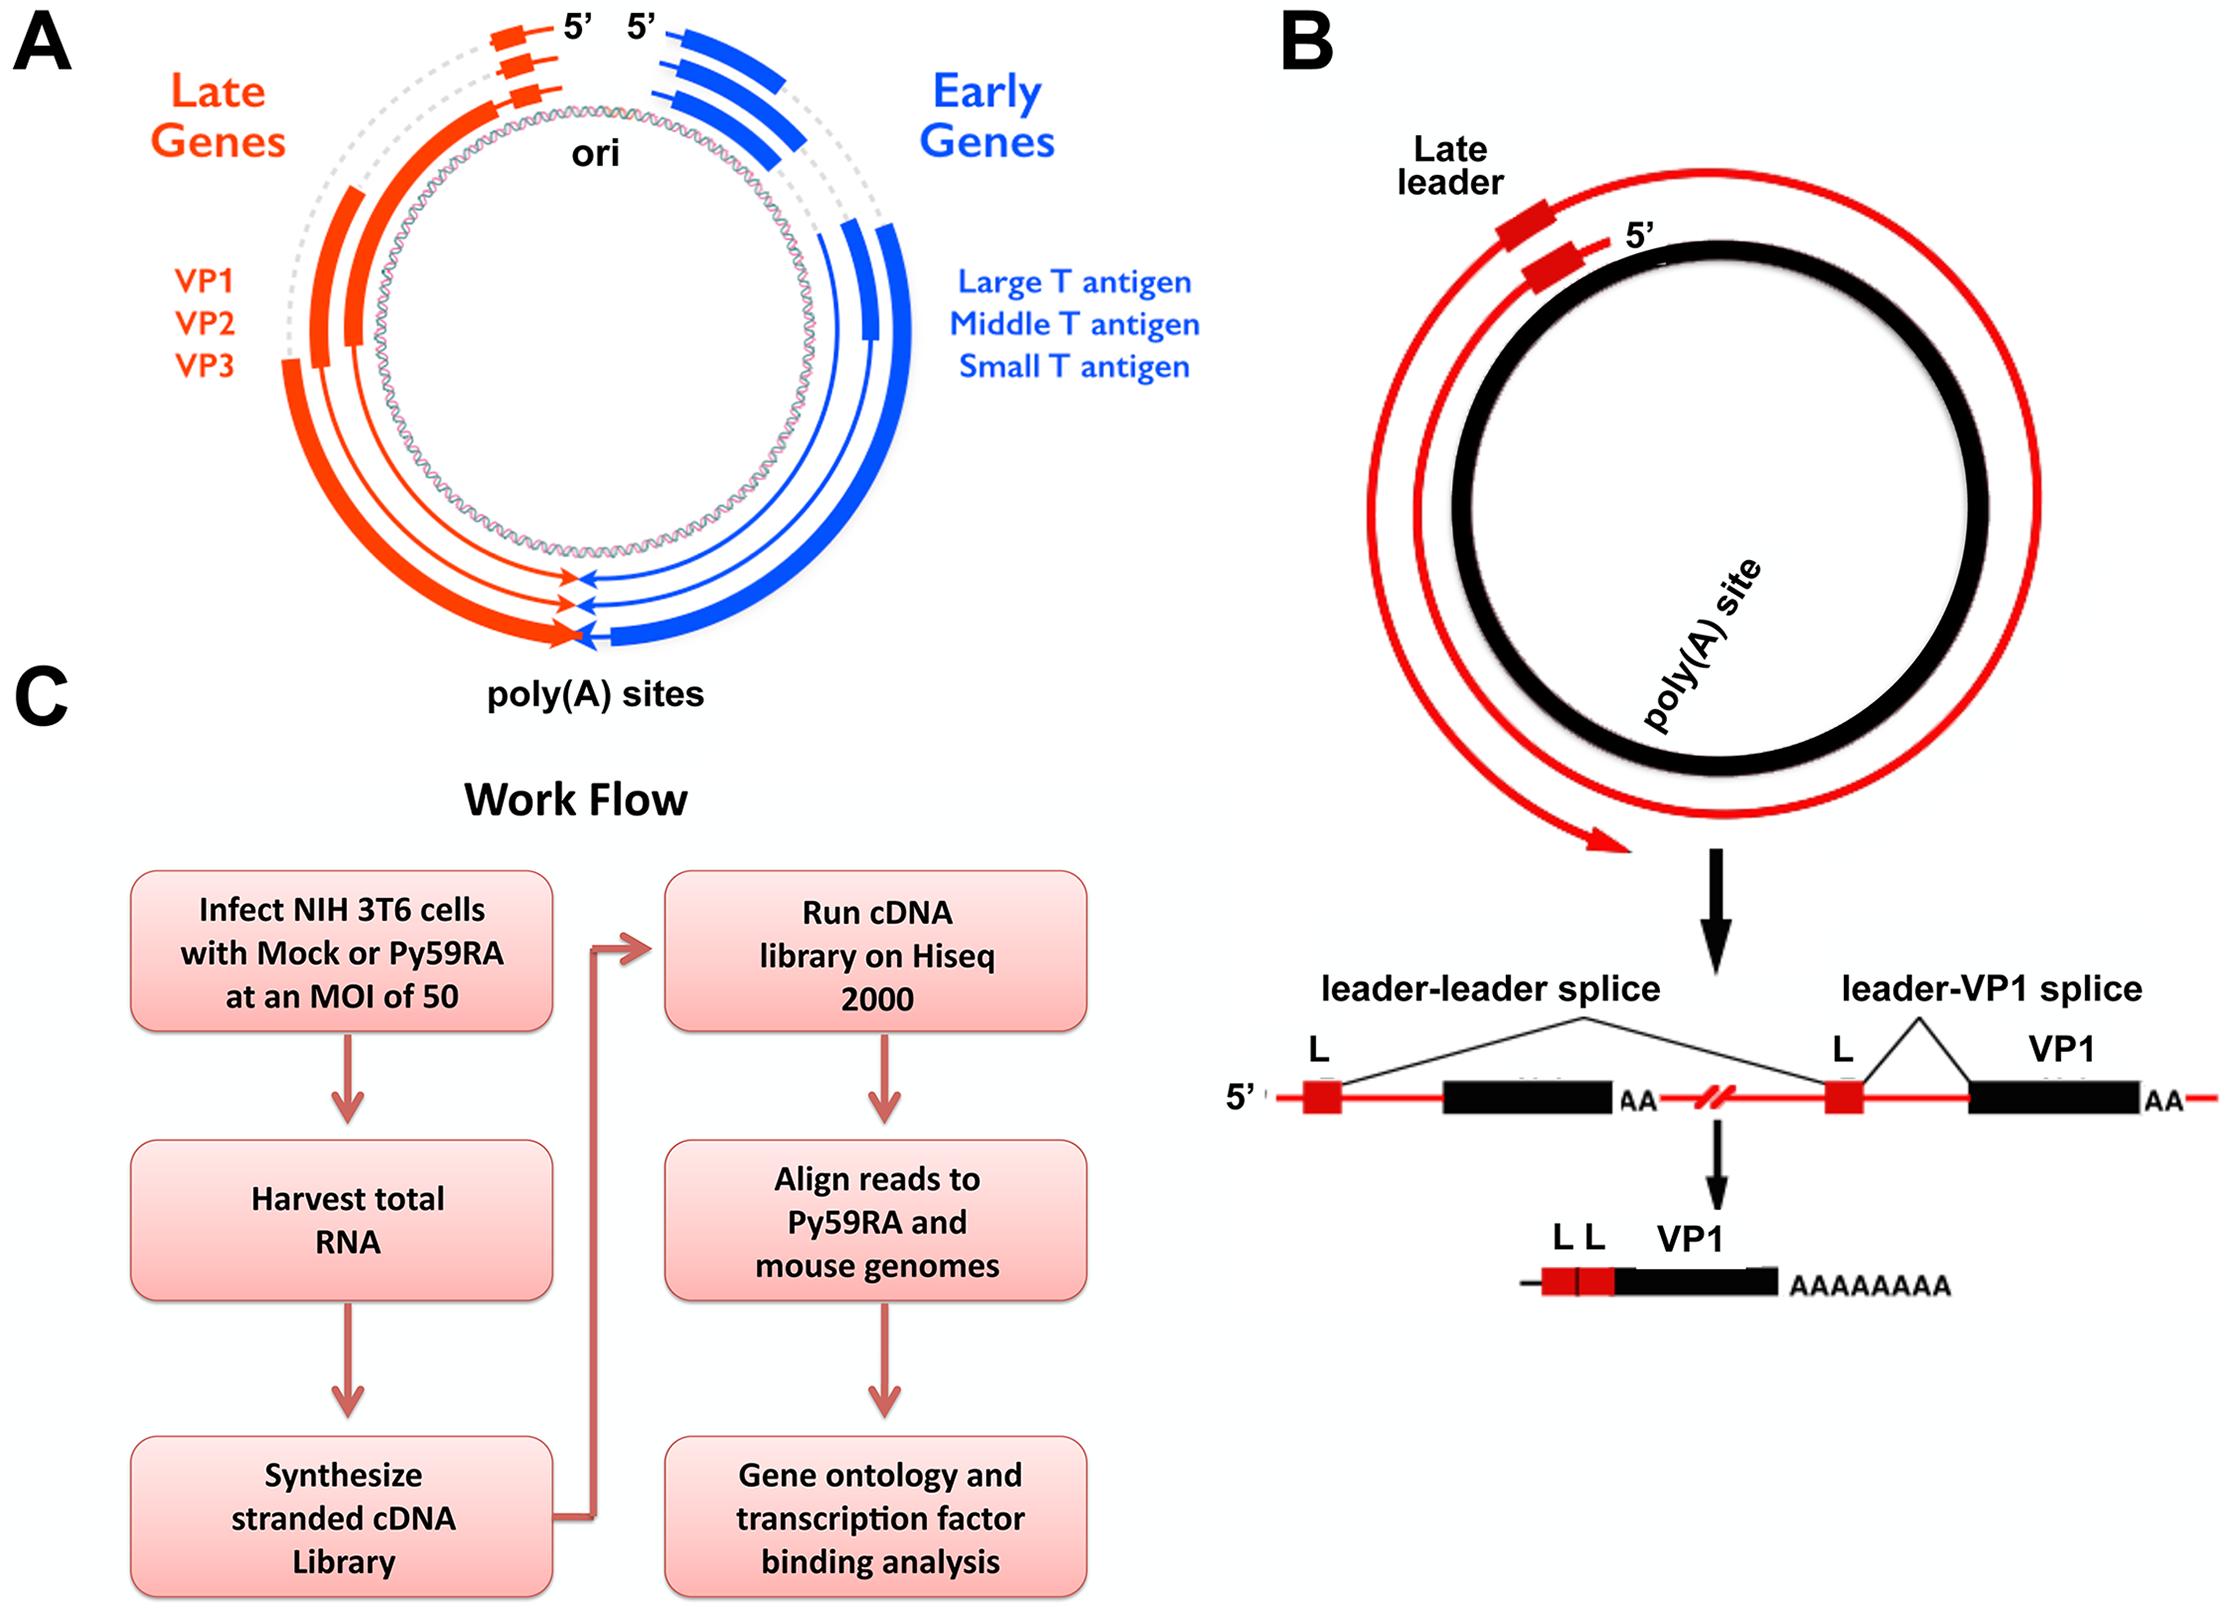 Polyomavirus genome and work flow.